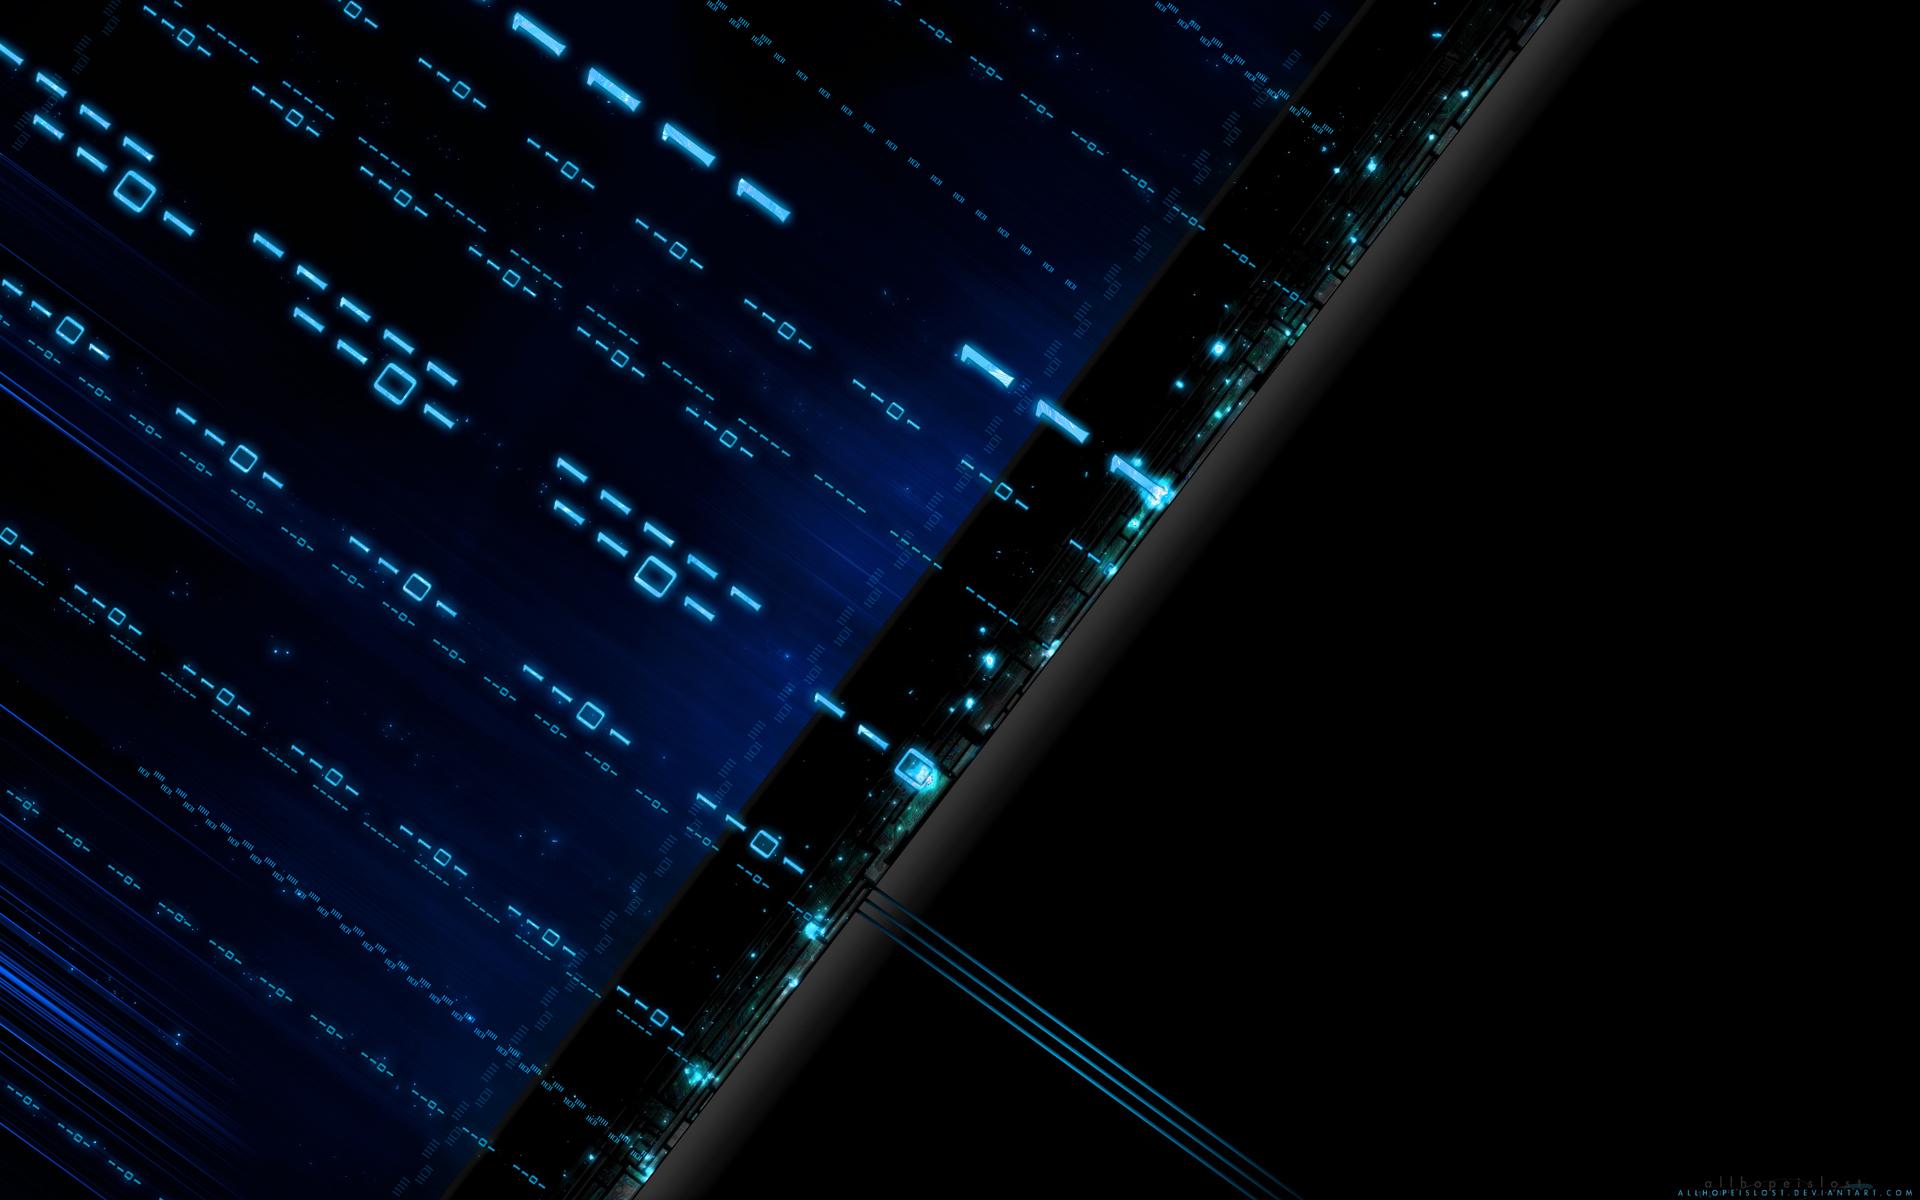 Binary Computer Wallpapers Desktop Backgrounds 1920x1200 ID74166 1920x1200